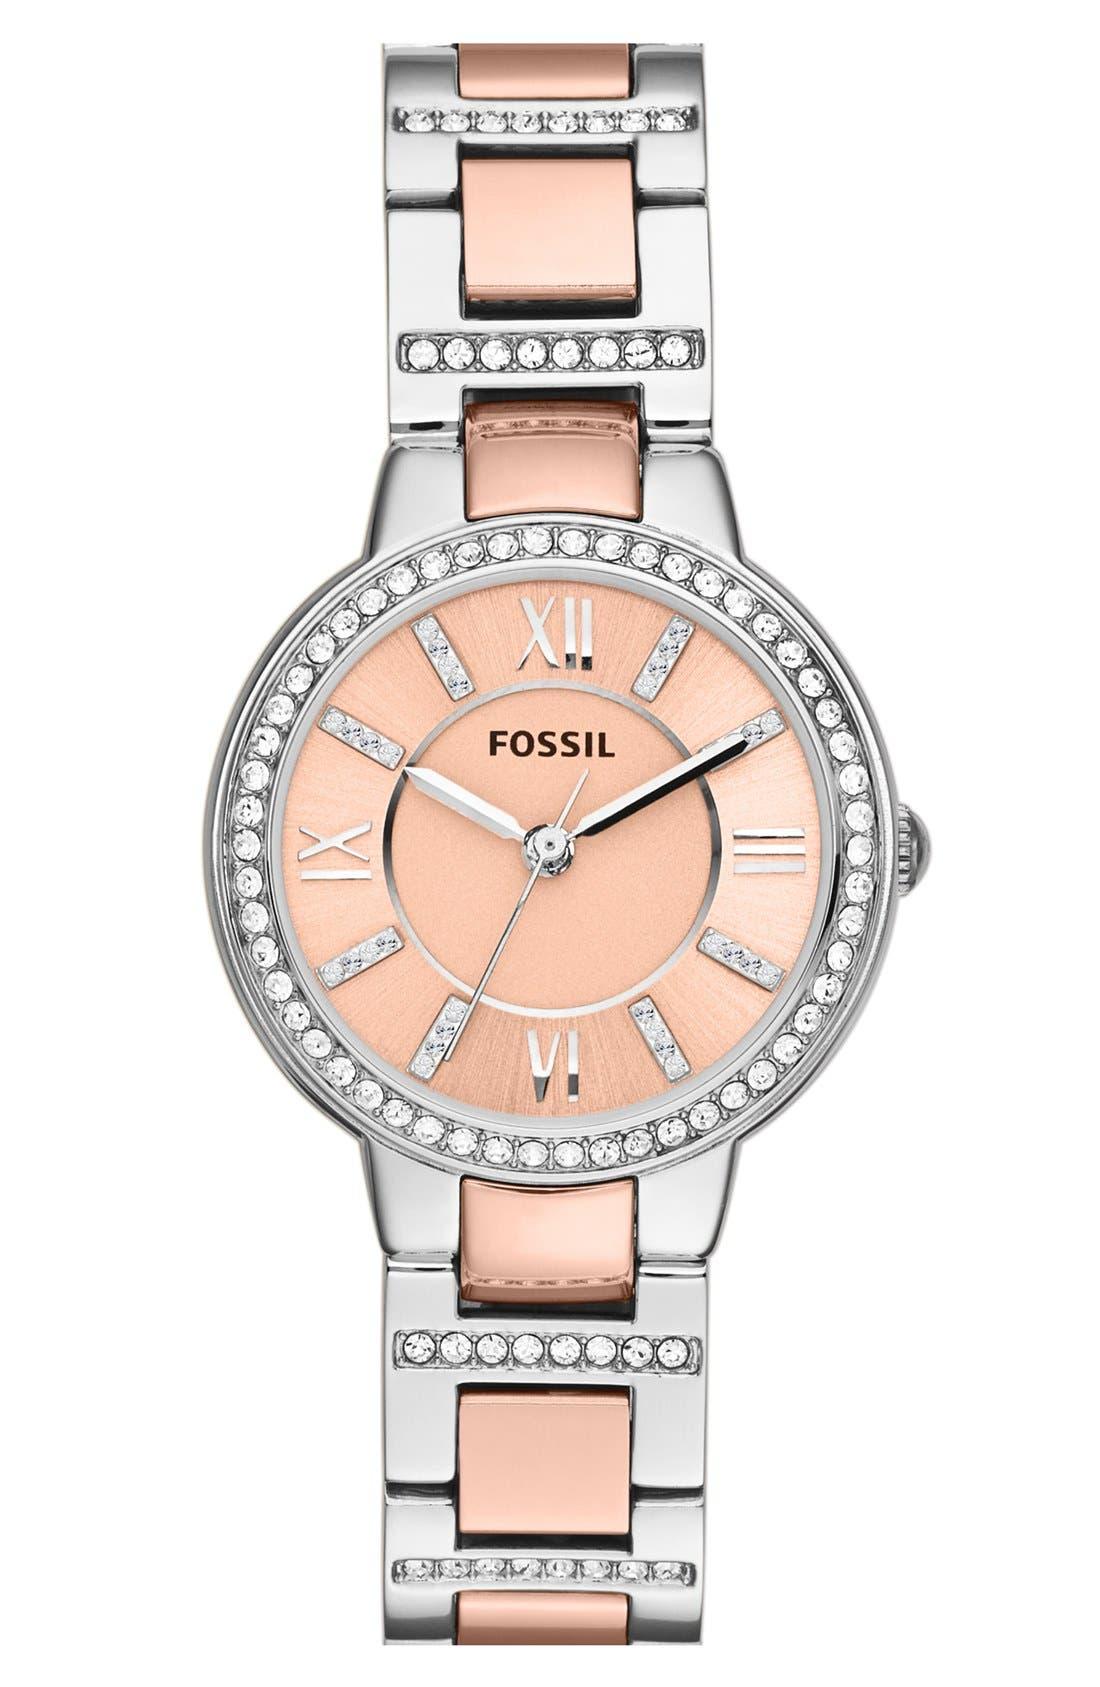 FOSSIL, 'Virginia' Crystal Bezel Bracelet Watch, 30mm, Main thumbnail 1, color, ROSE GOLD/ SILVER